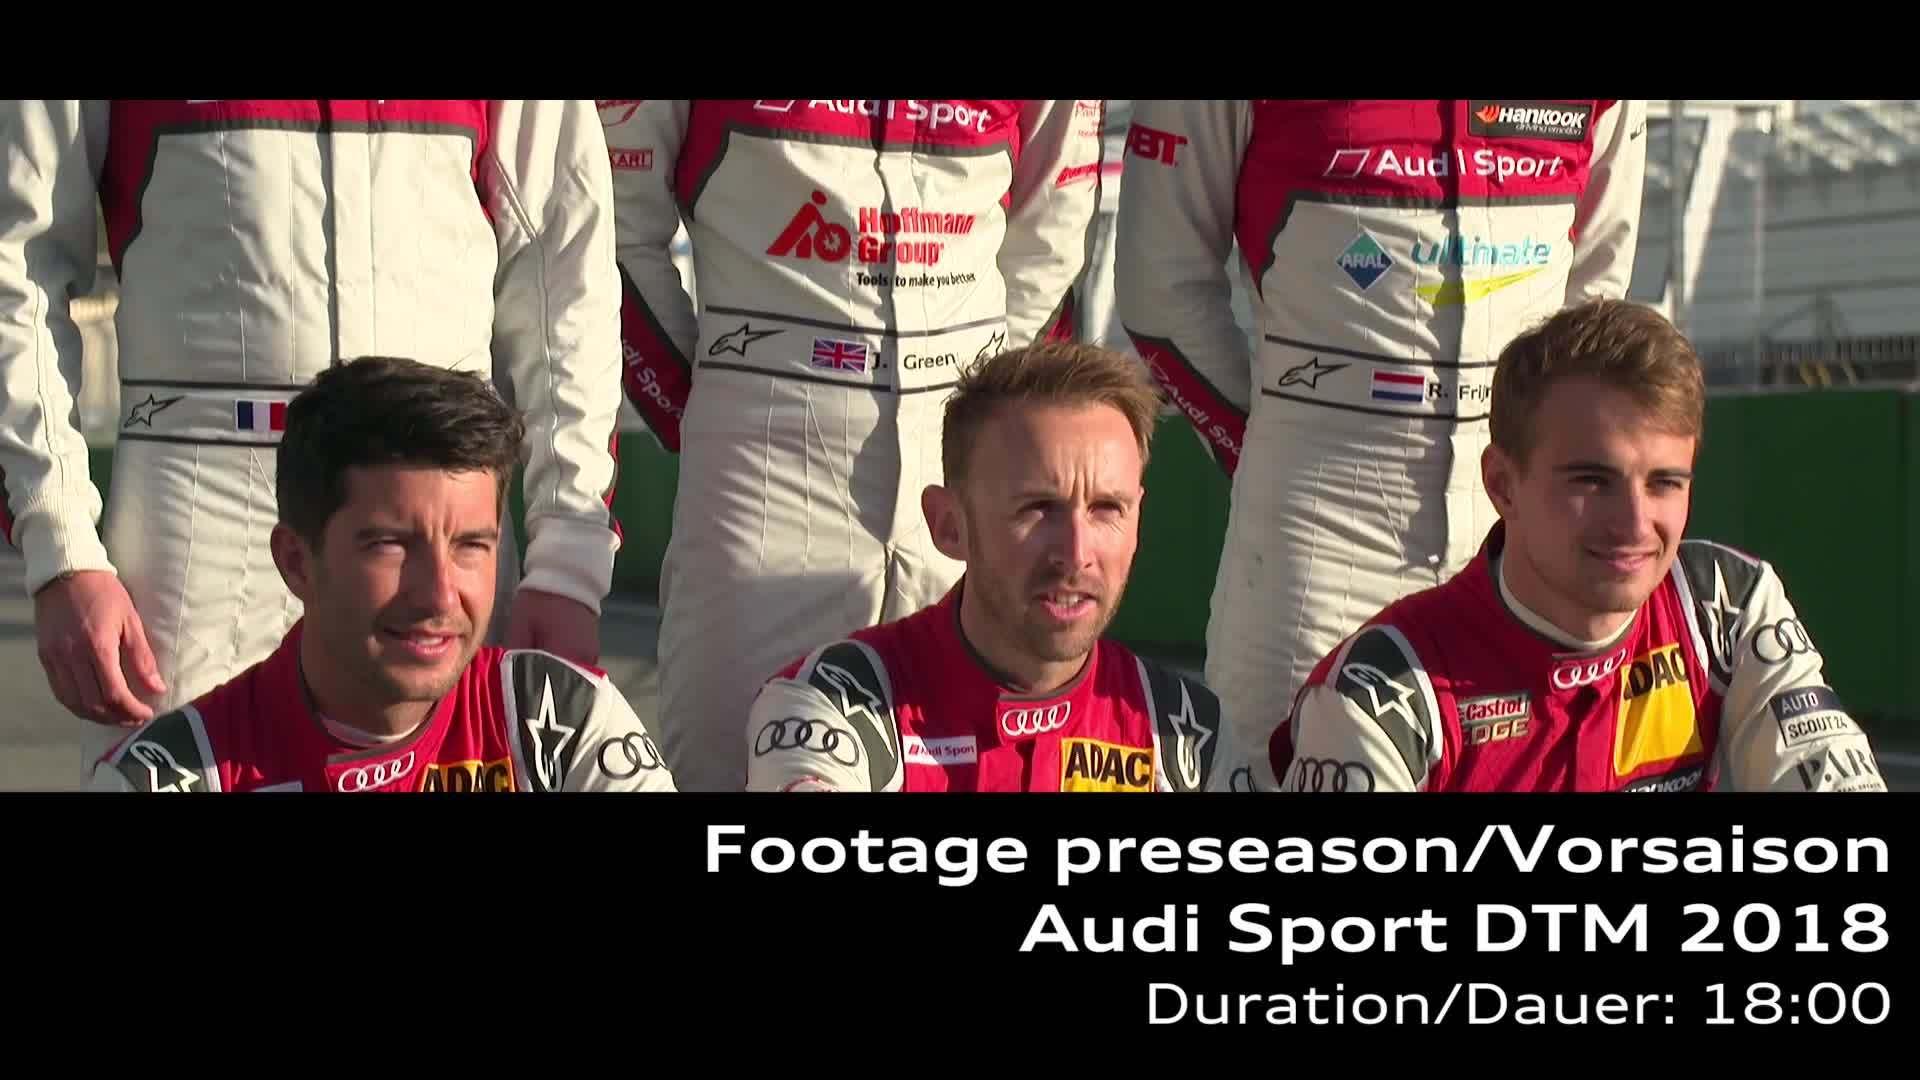 Audi Sport DTM 2018 Footage preseason